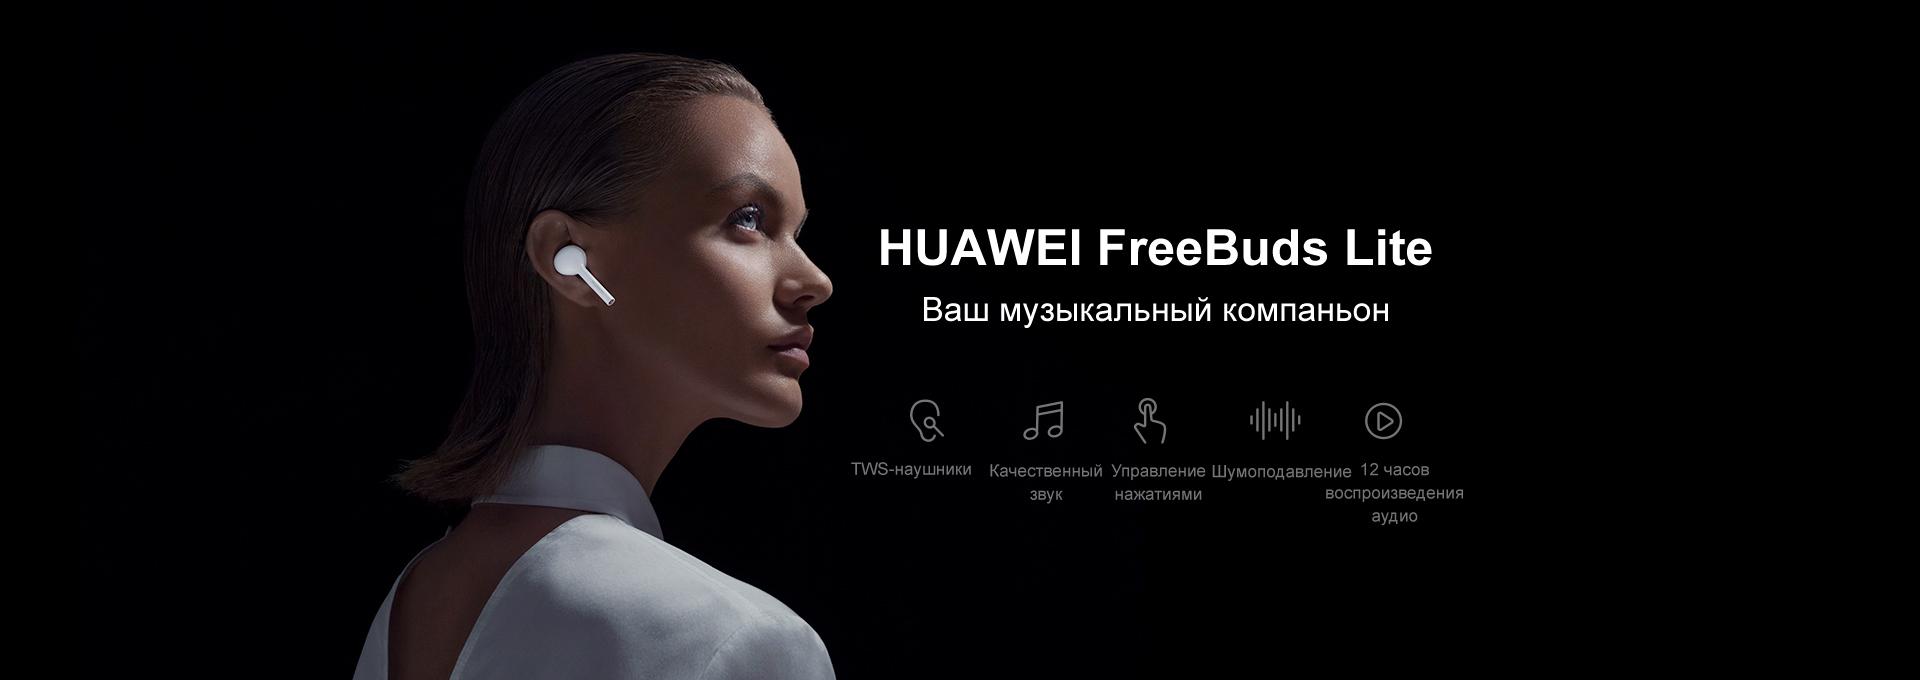 https://consumer.huawei.com/content/dam/huawei-cbg-site/other/ru/mkt/pdp/accessories/freebuds-lite/img/01.jpg